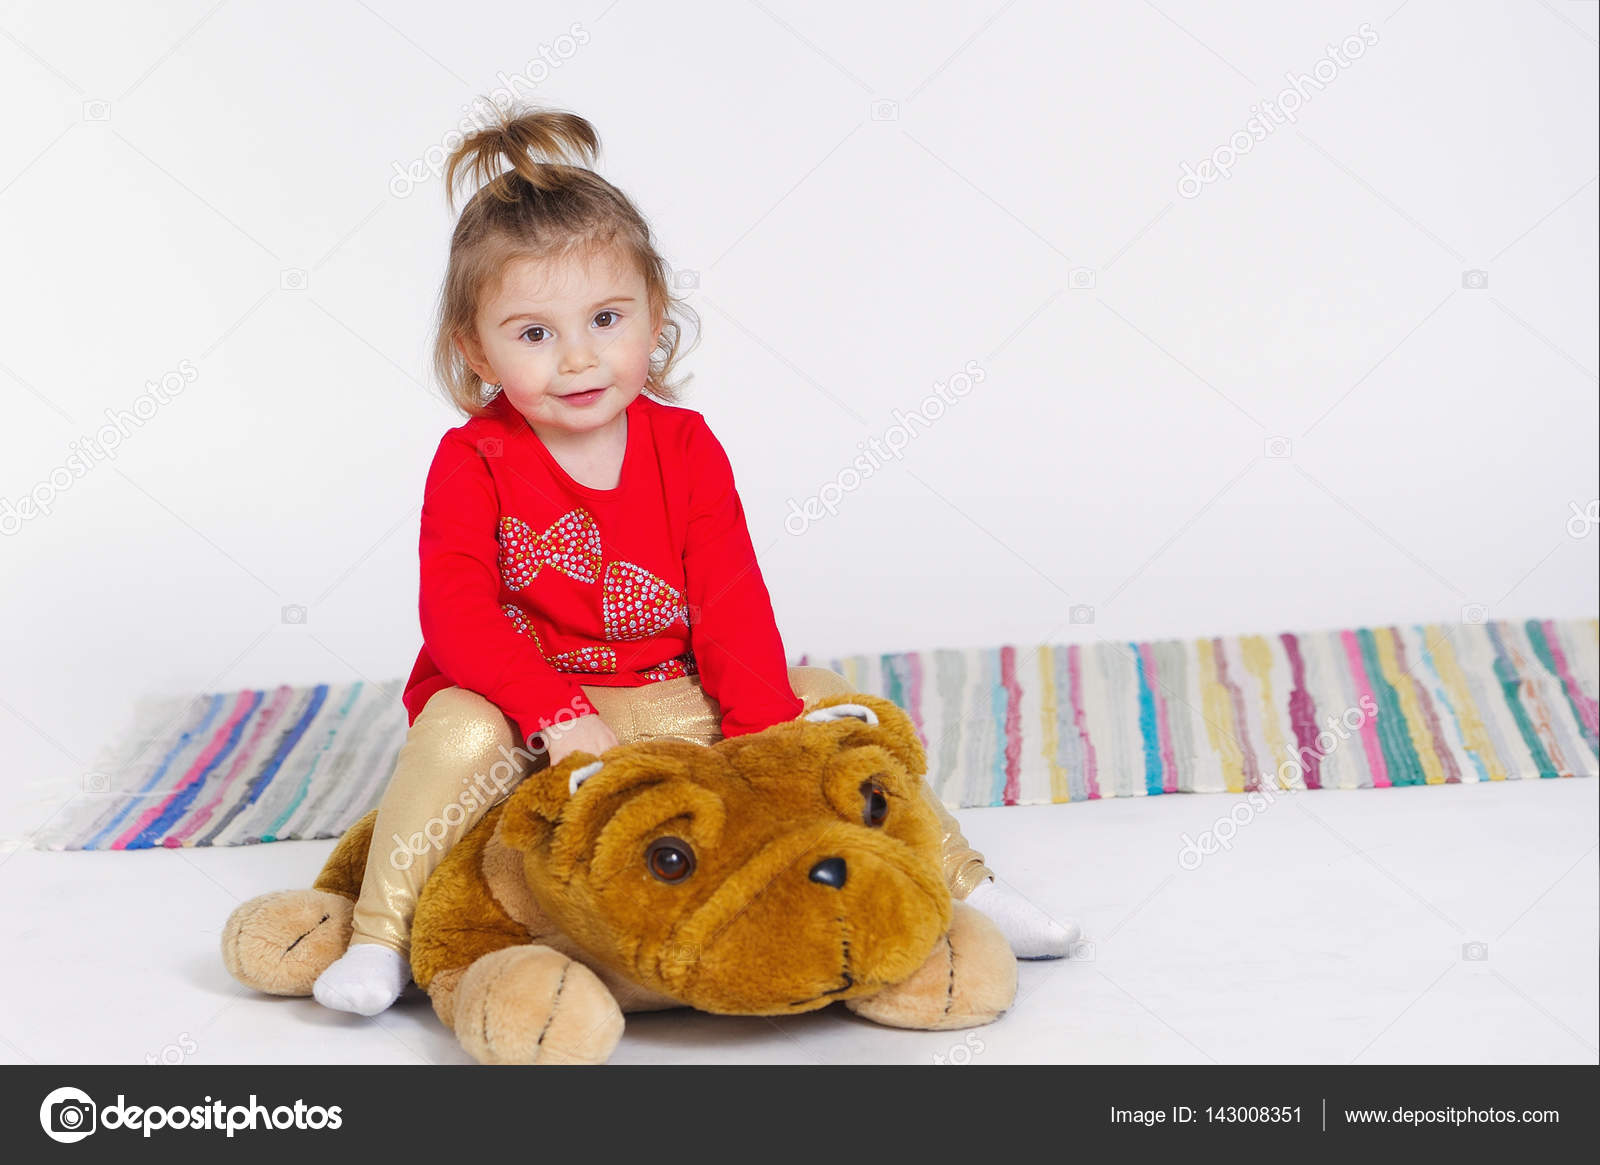 bear teddy Girl rides